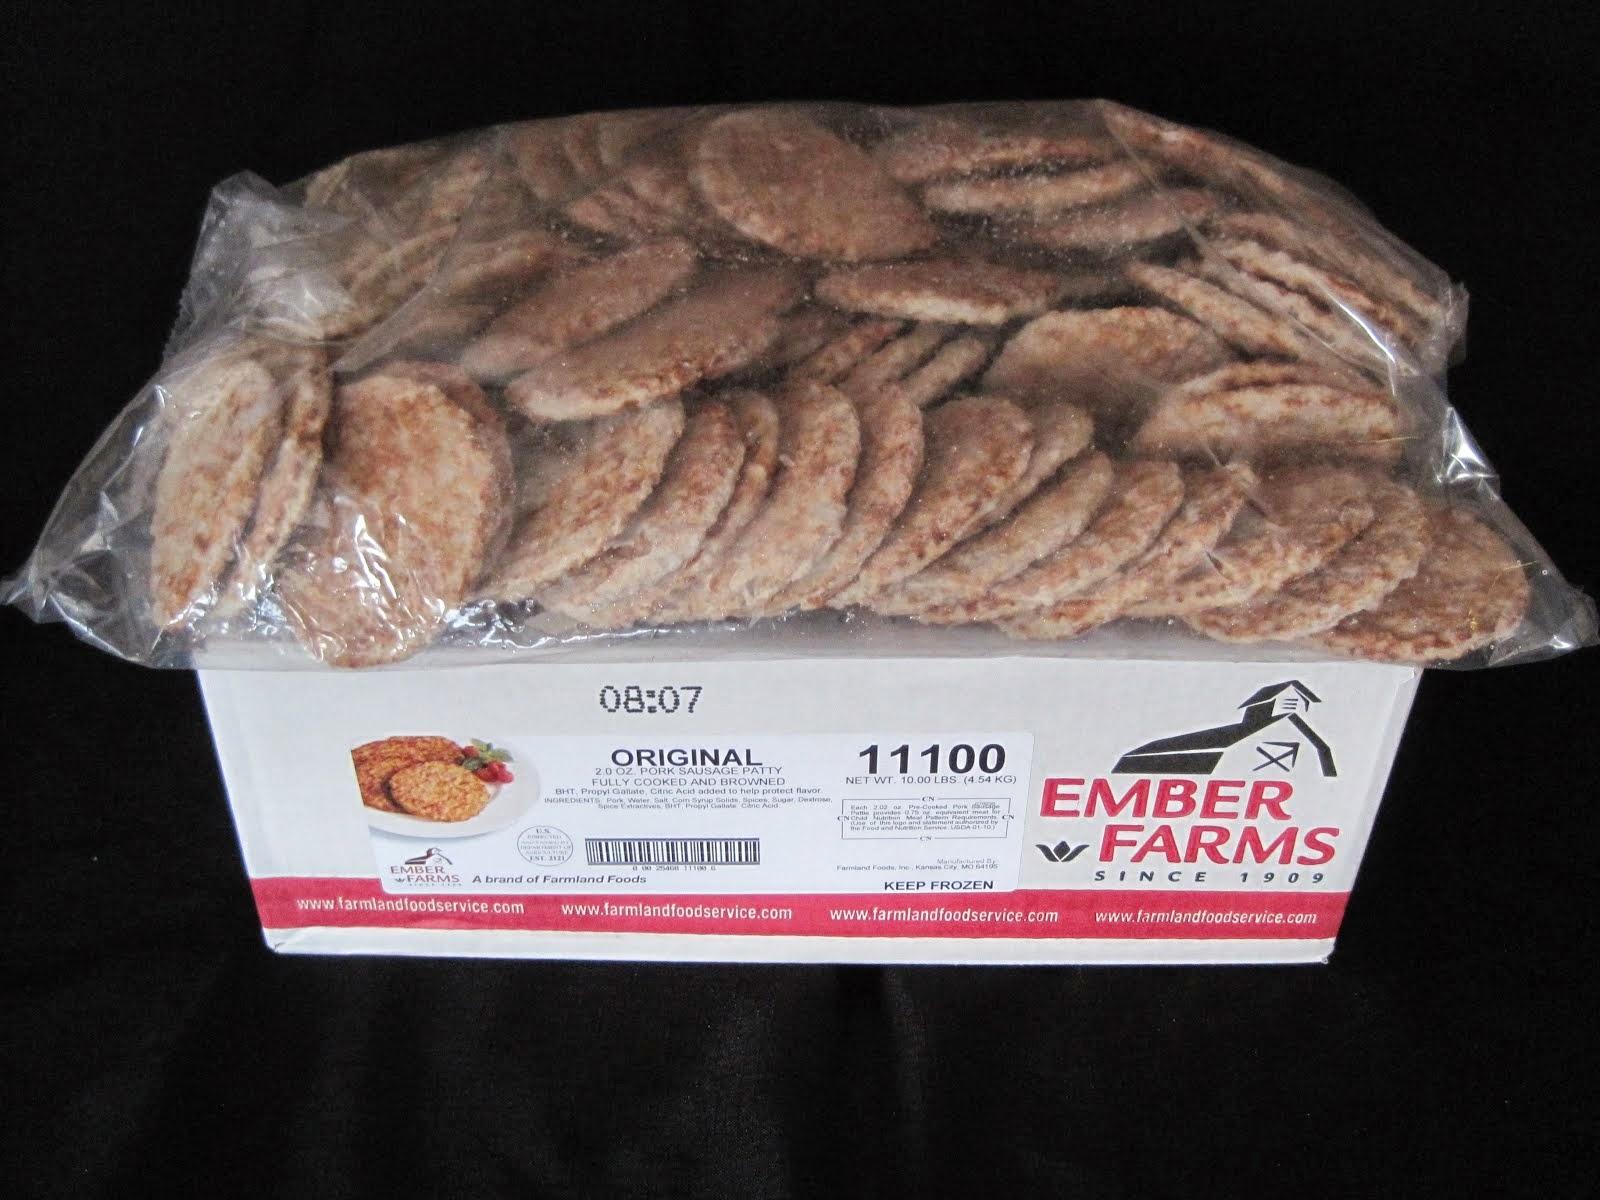 Ember Farms 2 oz Sausage Patties 10 lb - Item # 15930